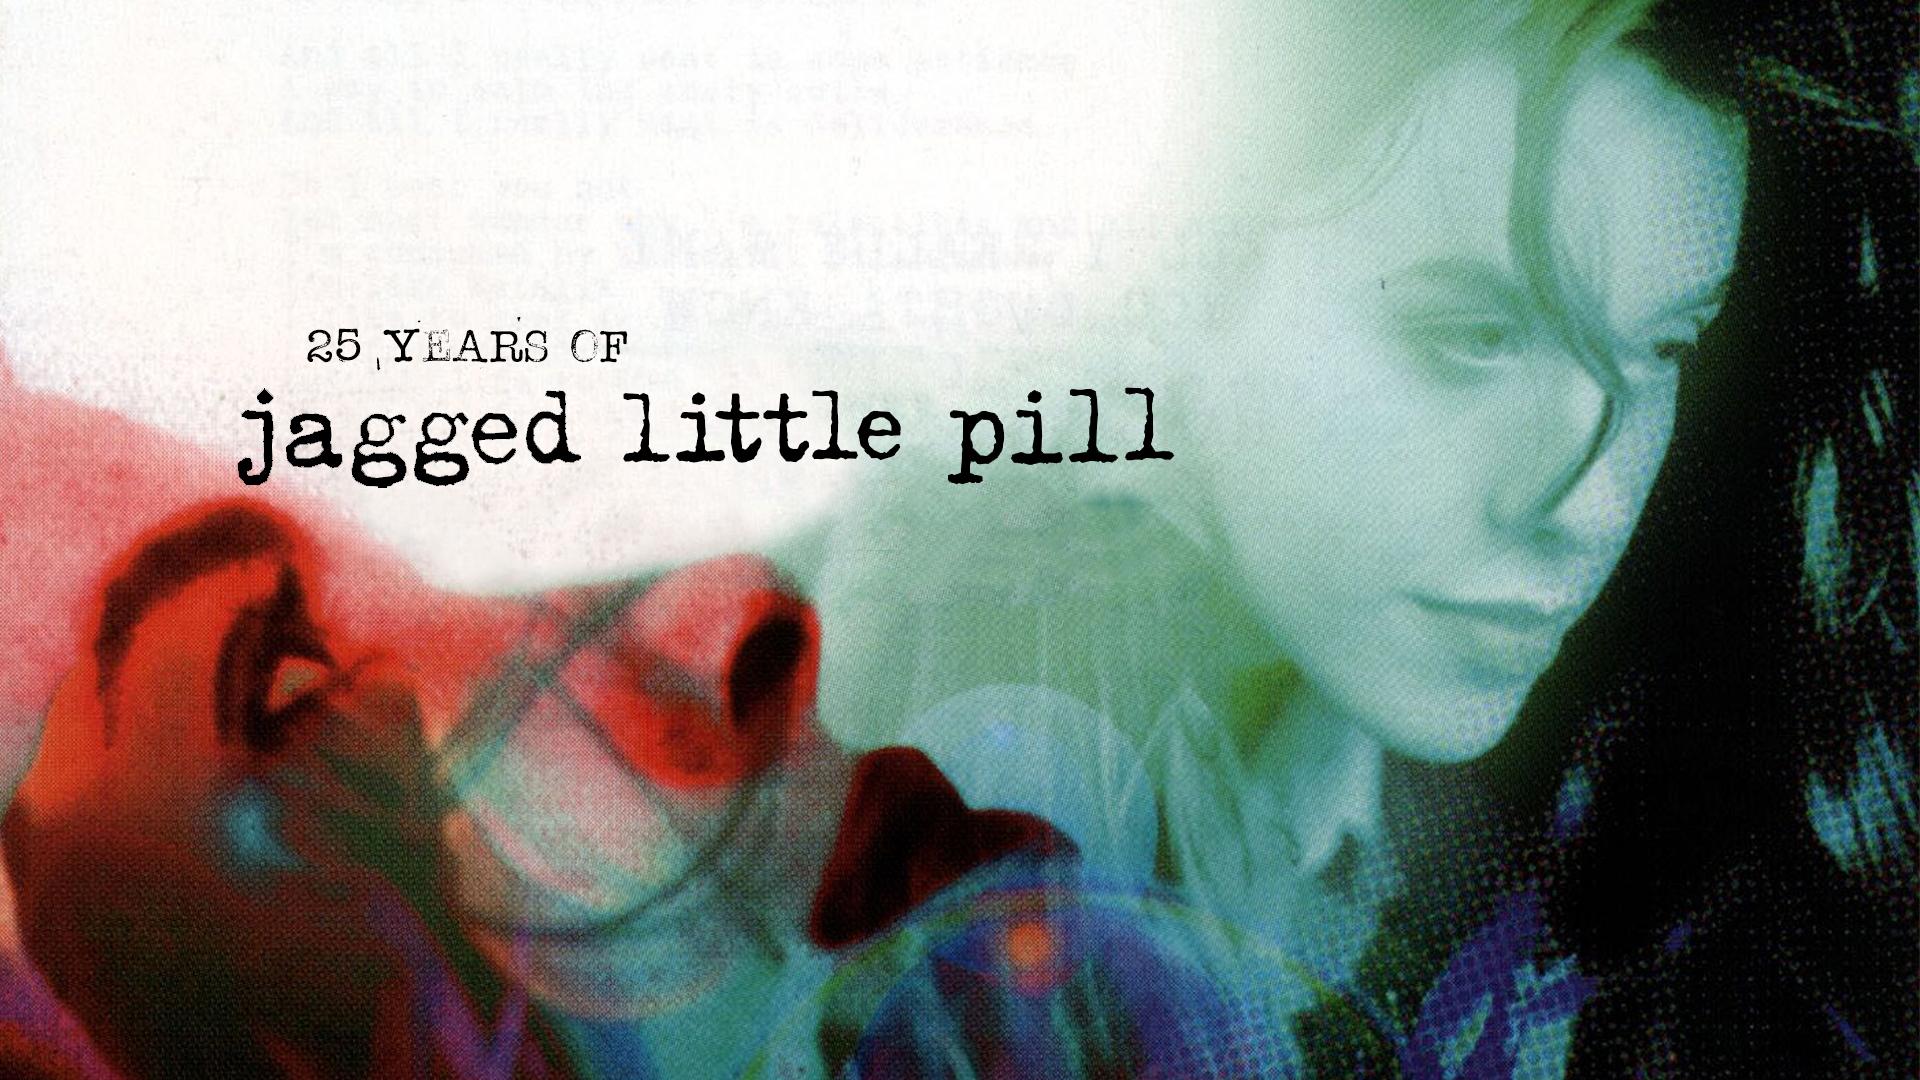 alanis morissette jagged little pill 25th anniversary